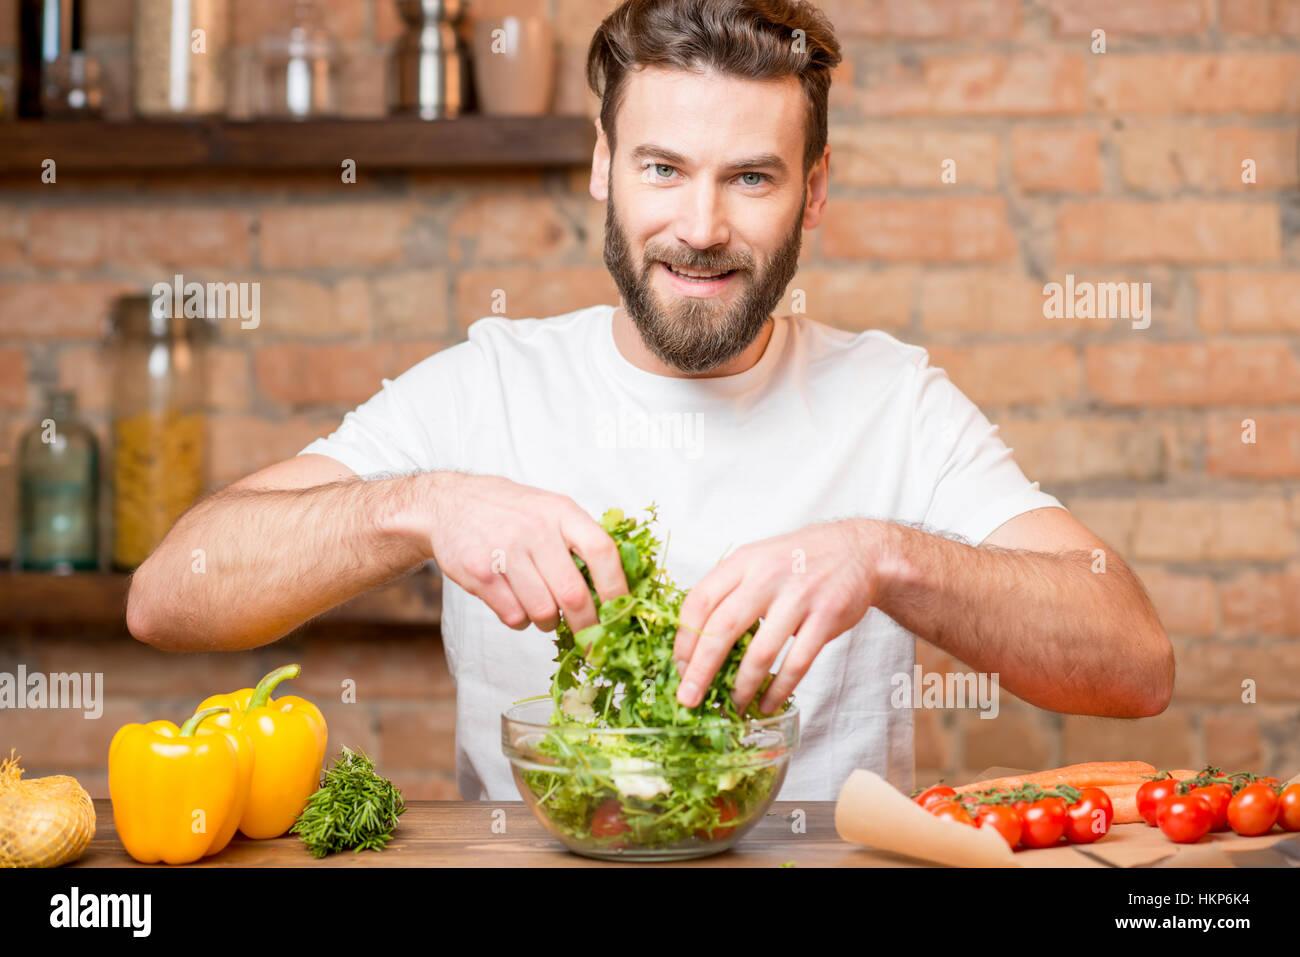 Man making salad Photo Stock